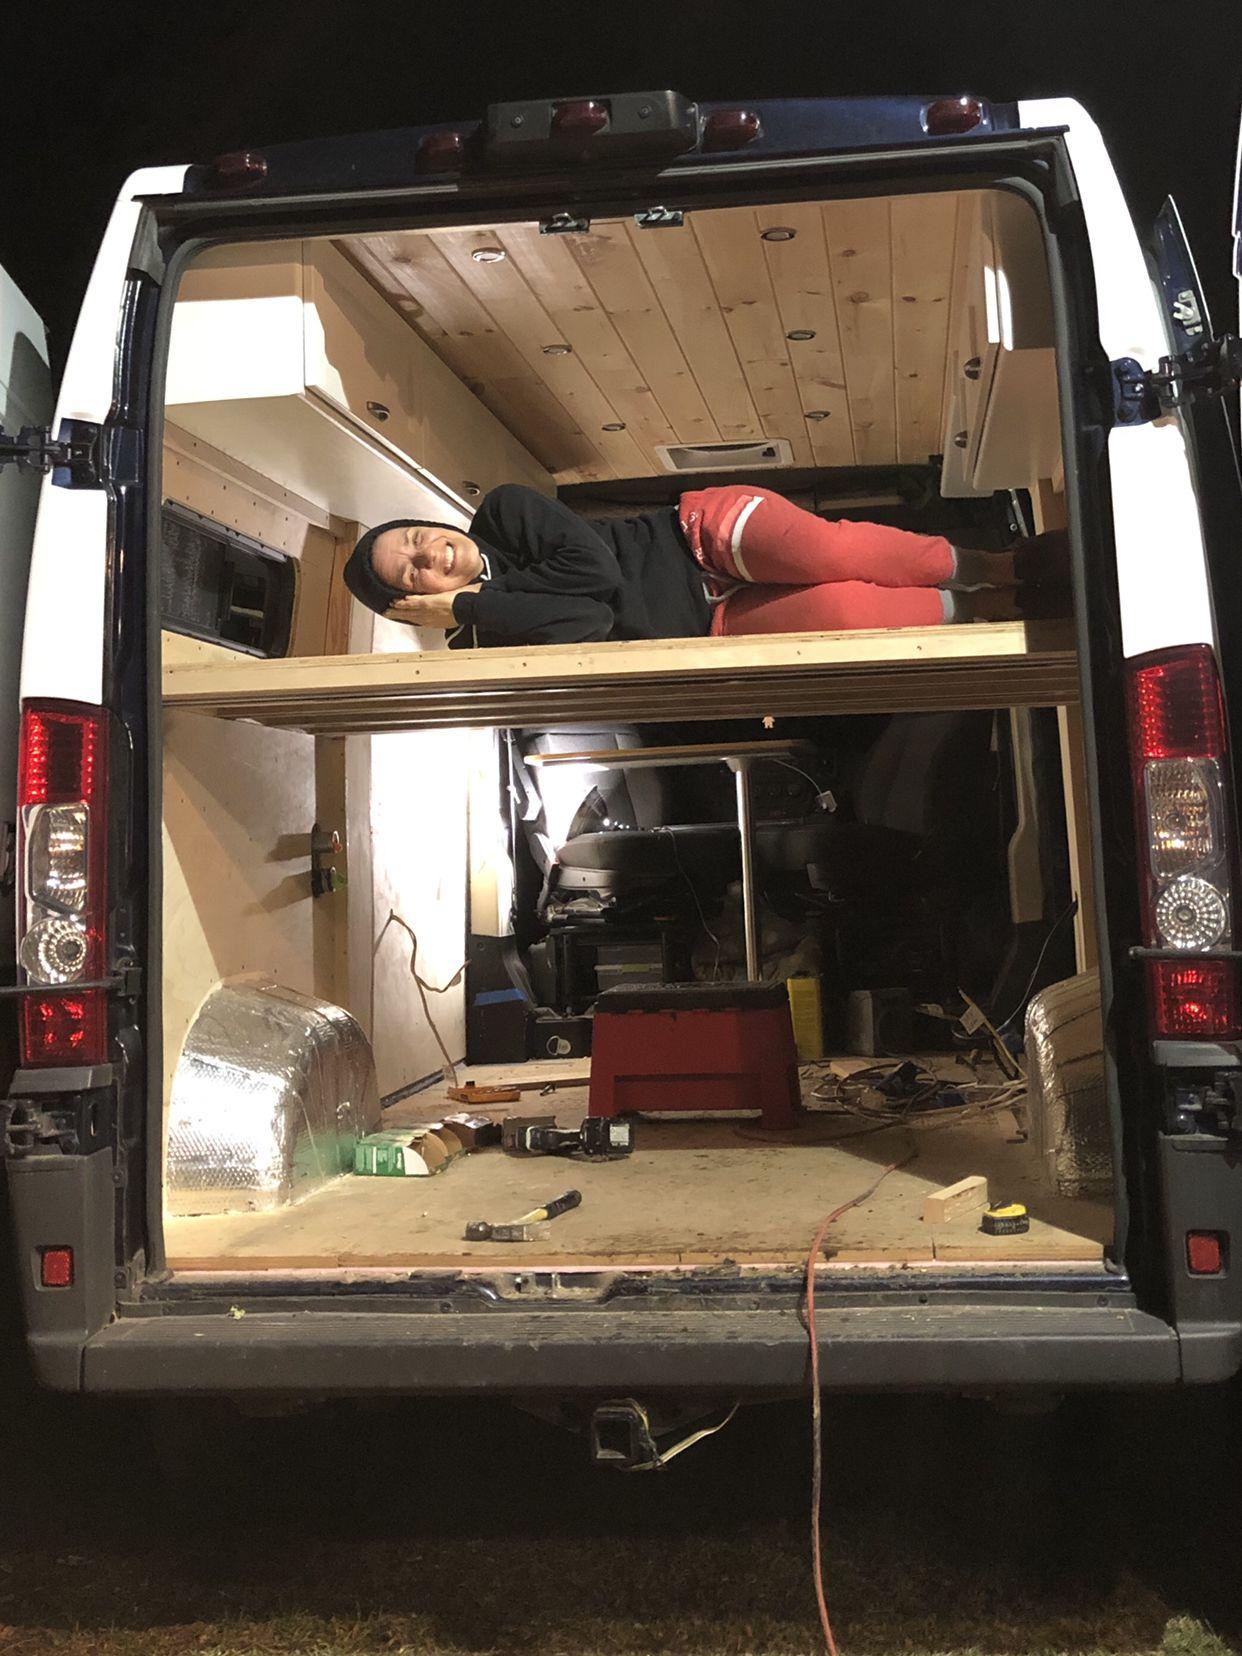 Dyi Camper Van Bed Build Build A Platform Bed Van Bed Chic